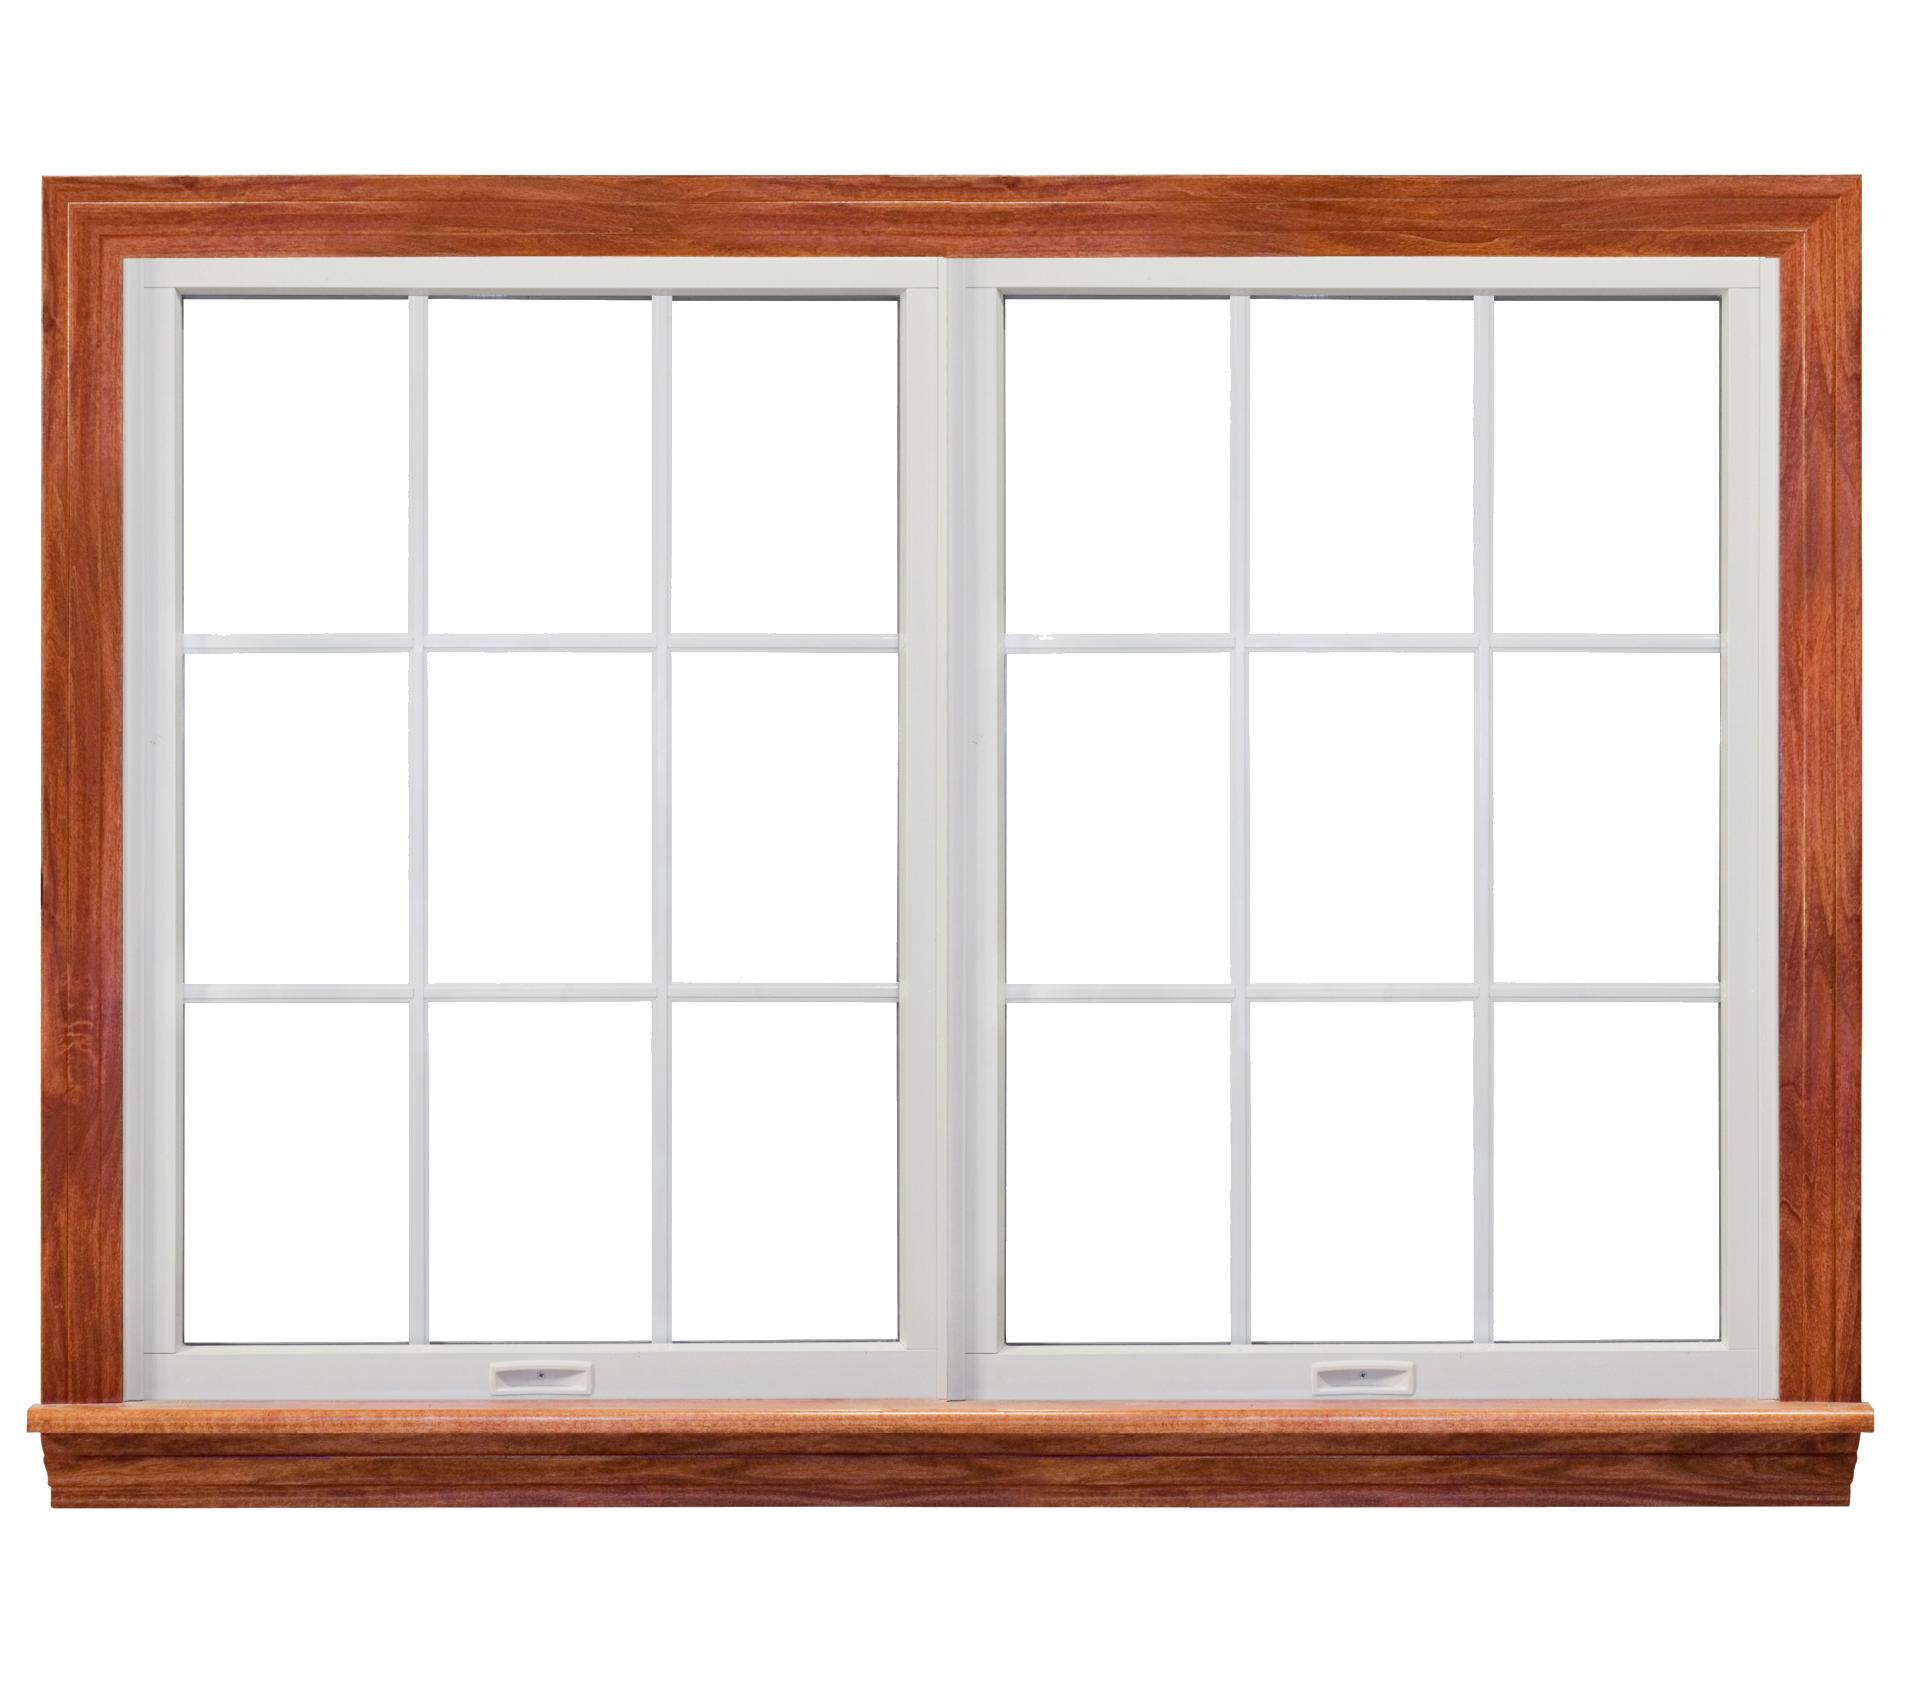 Window PNG Image - PurePNG